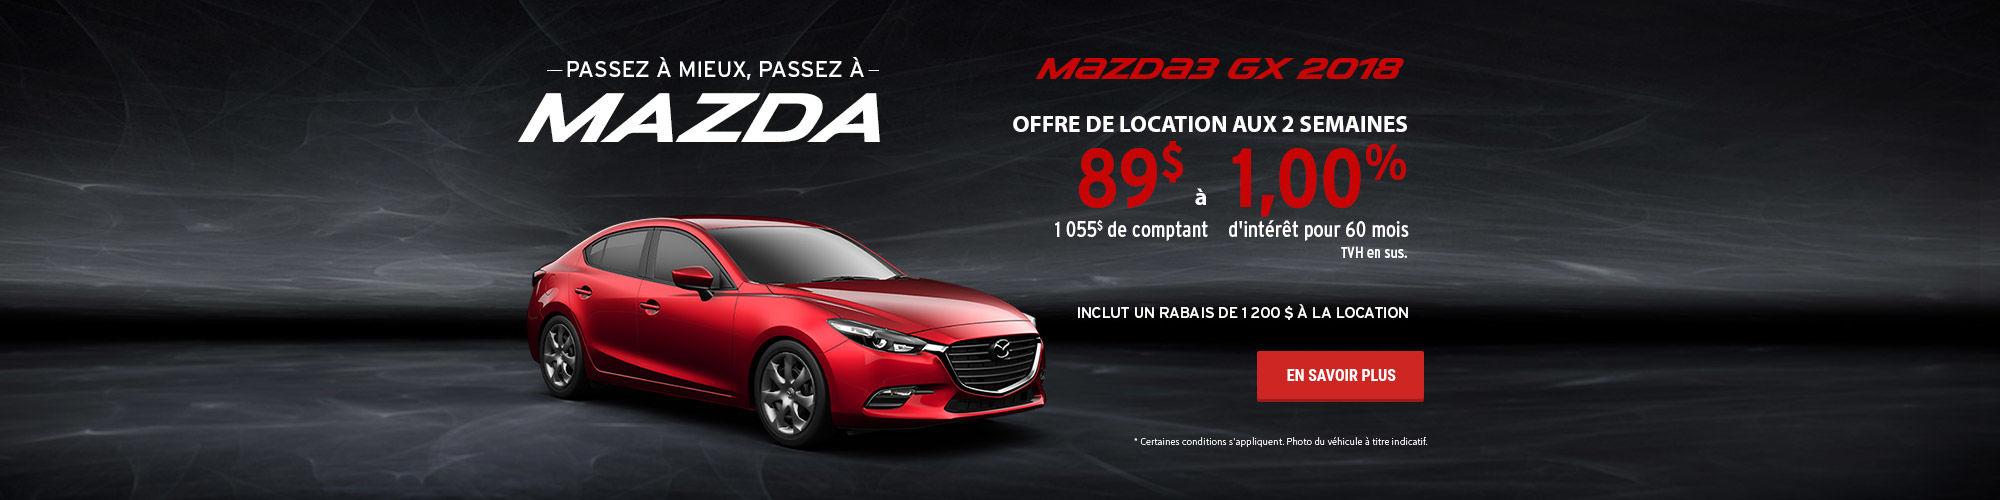 Passez à mieux, passez à Mazda - Mazda3